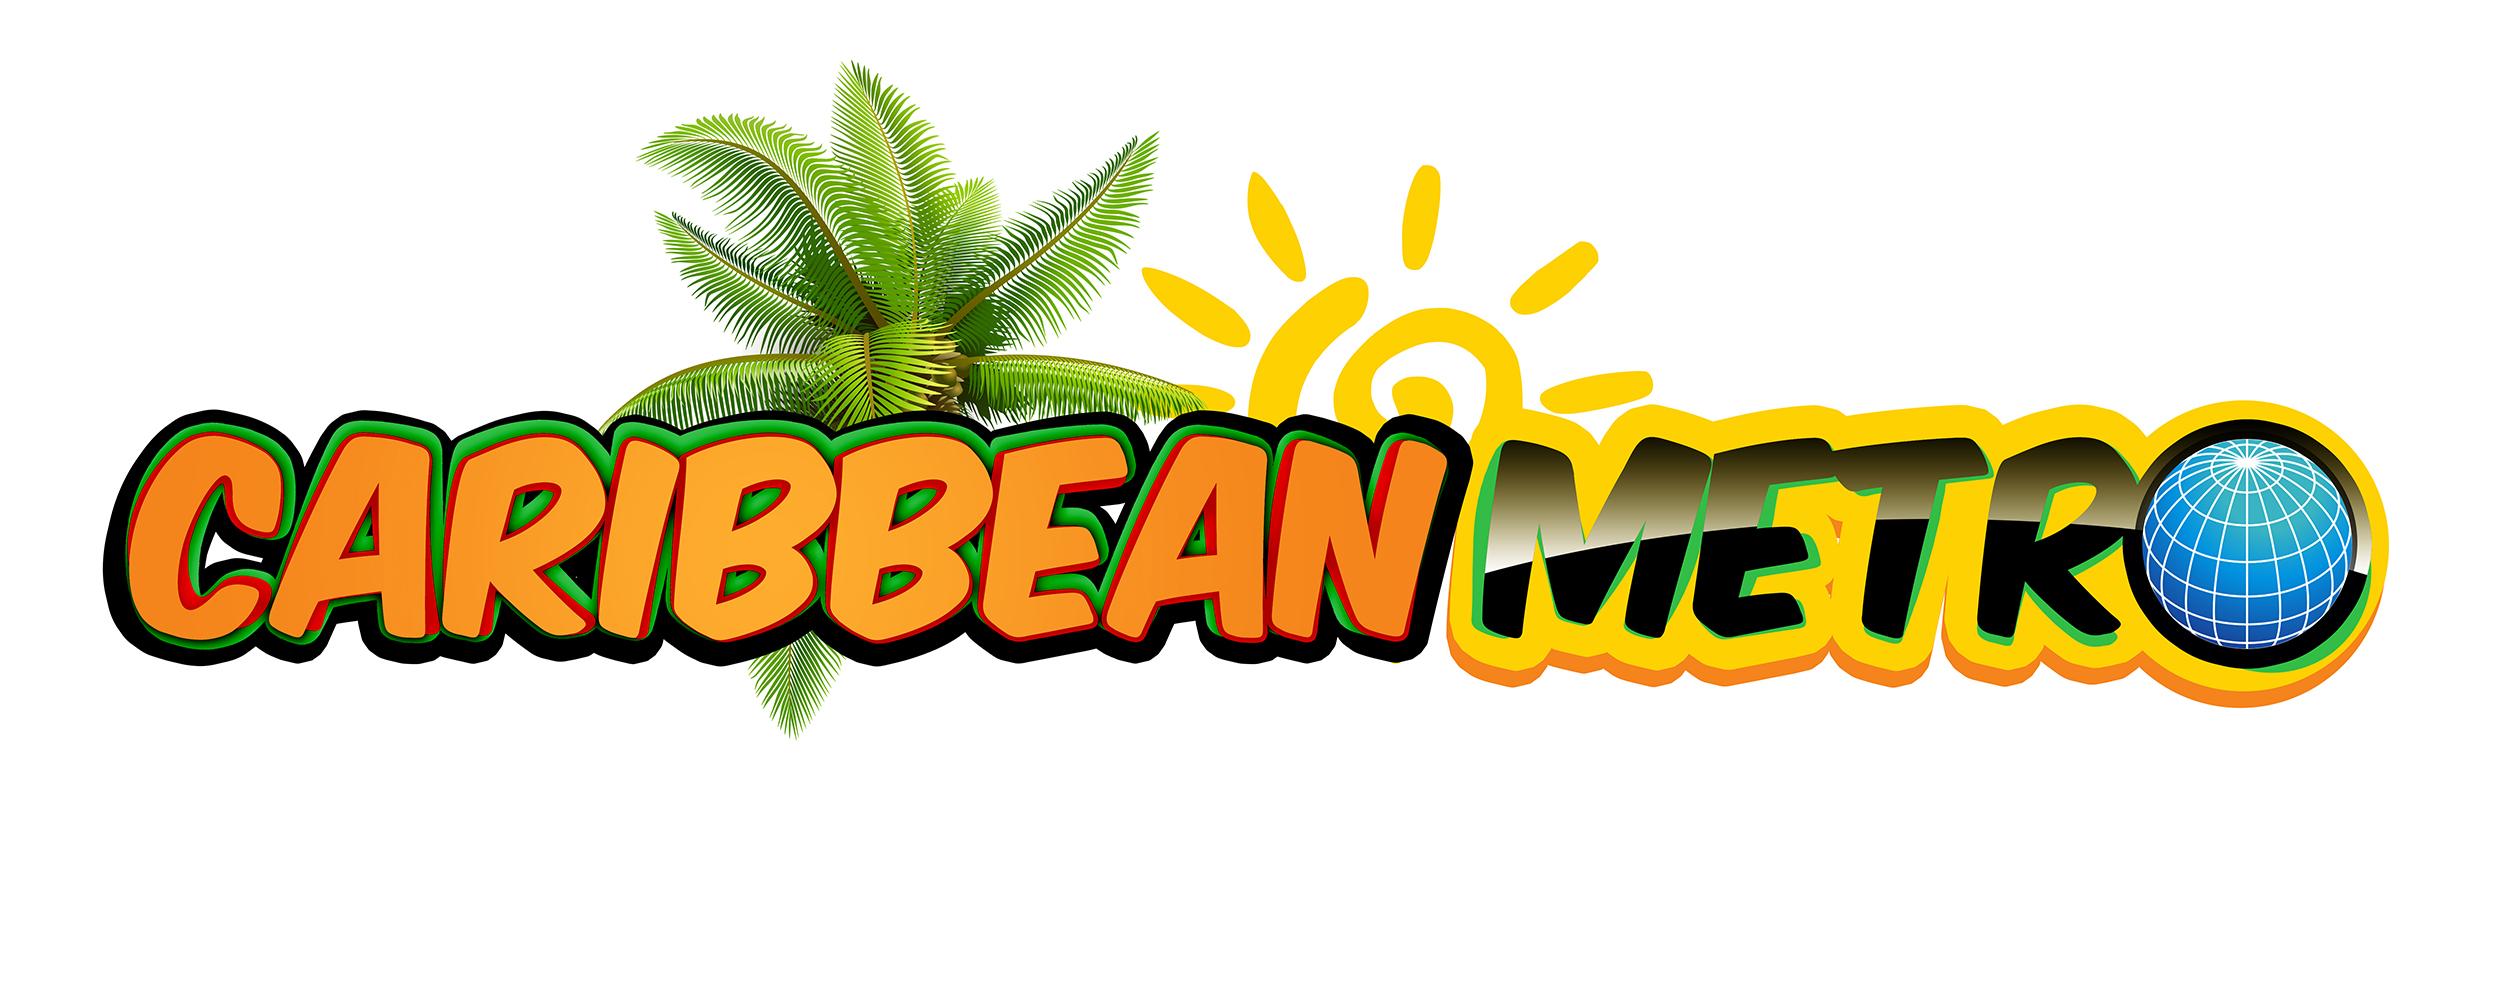 Caribbean Metro2.jpg